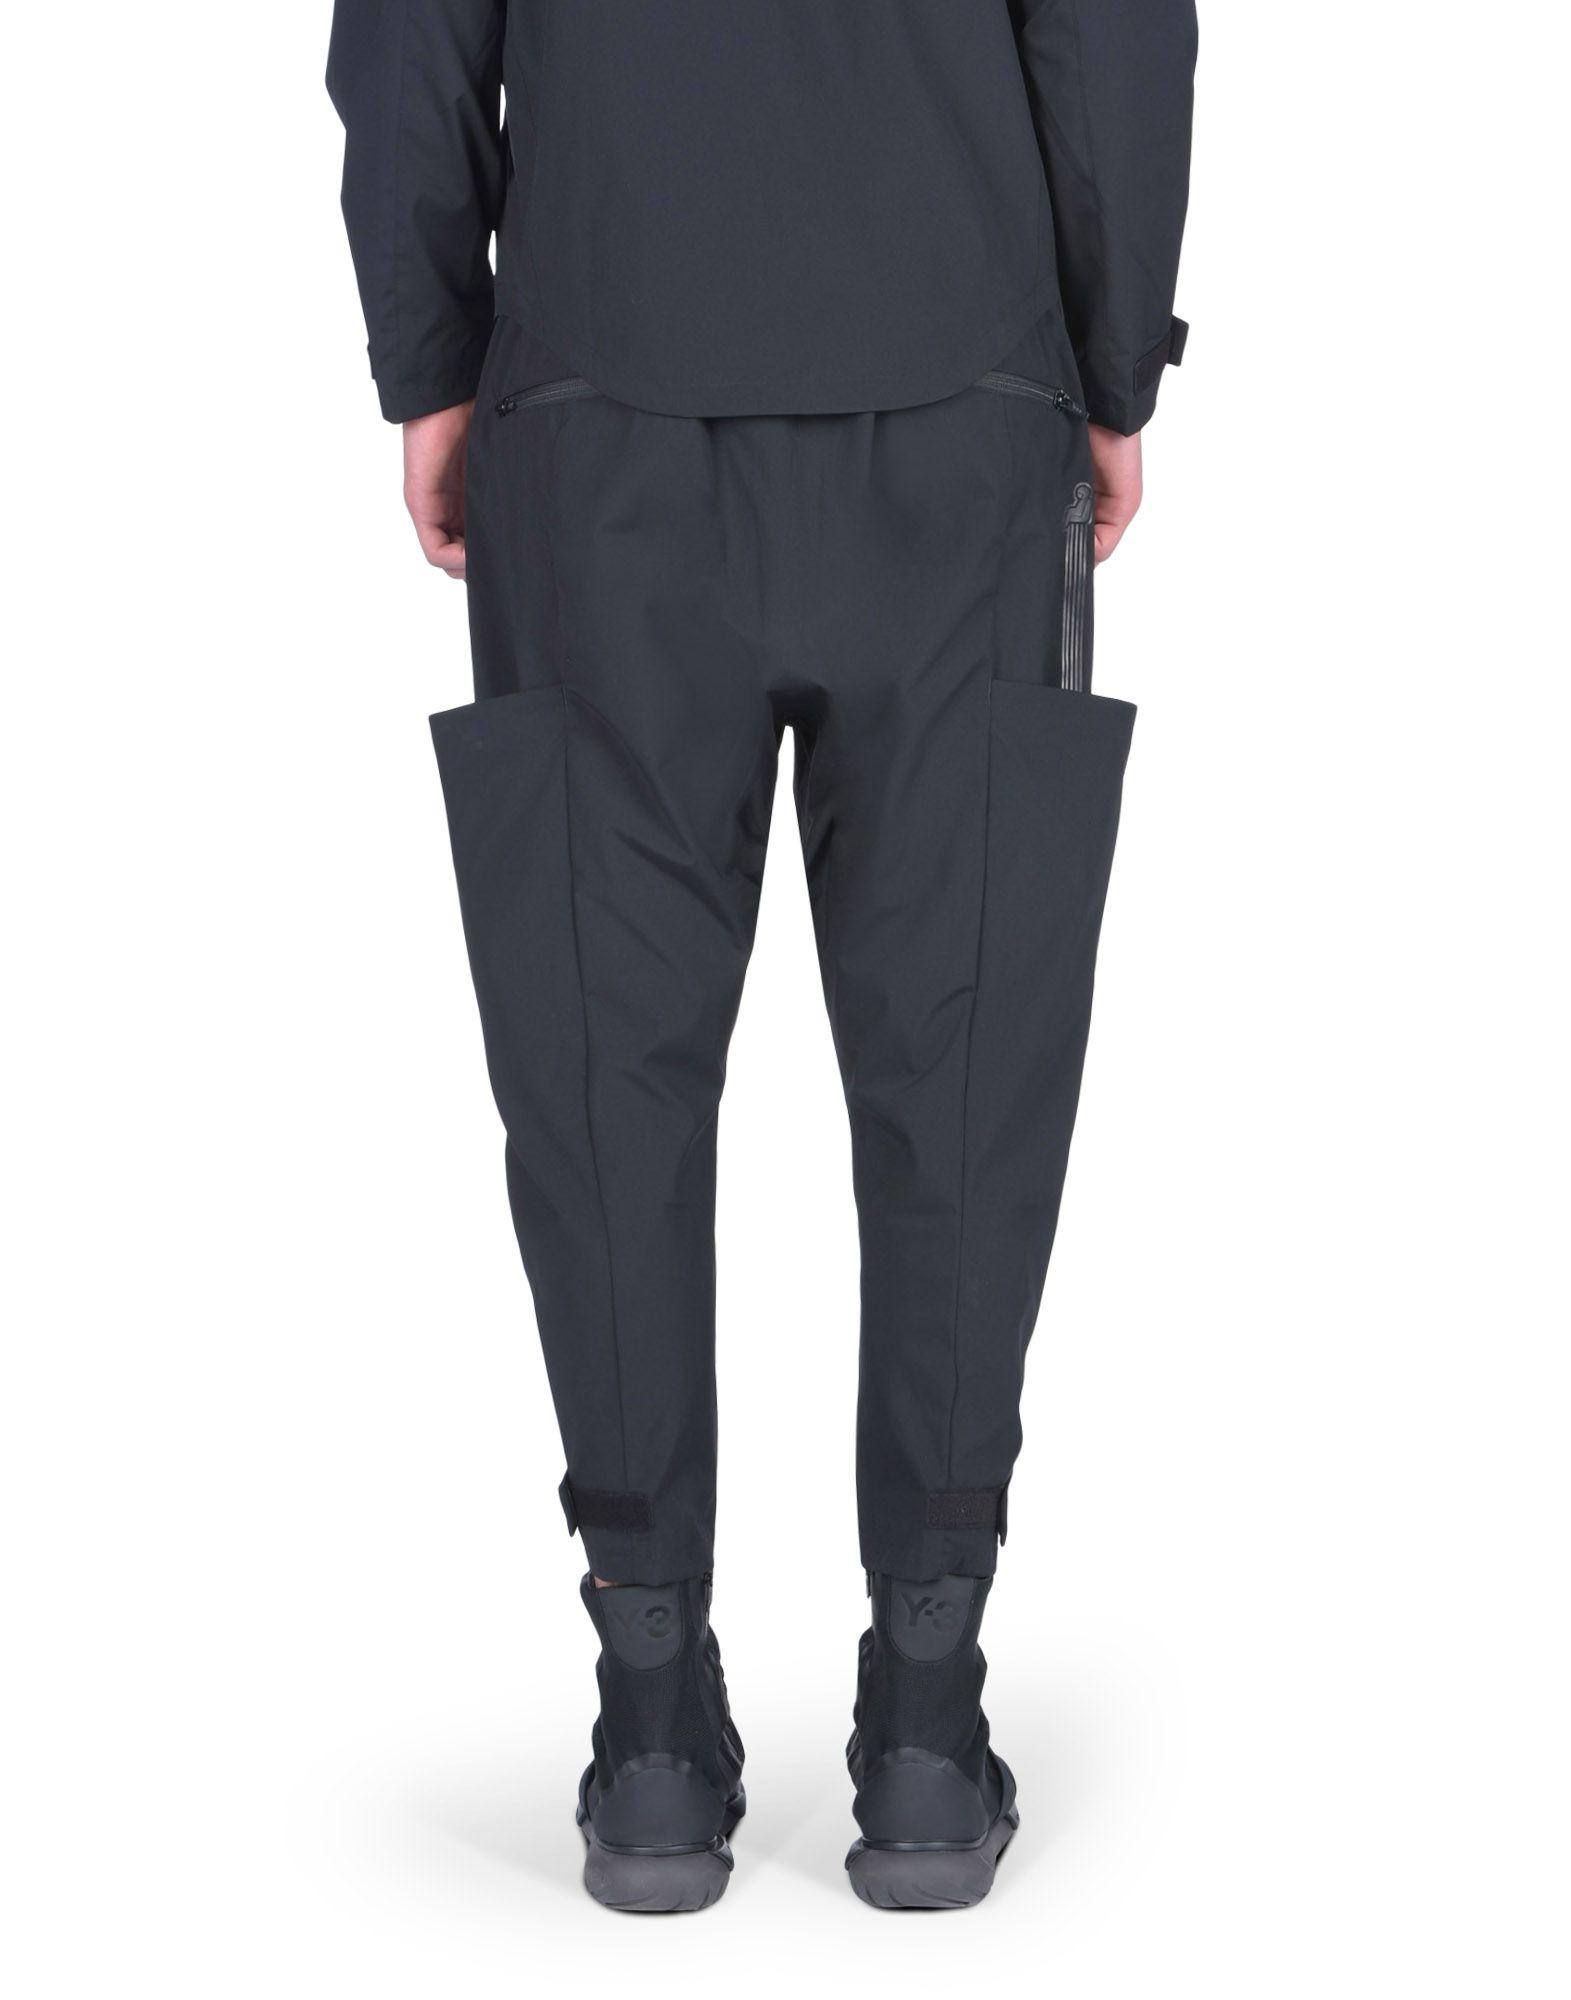 Y-3 Y-3 MINIMALIST PANT Casual trouser Man e